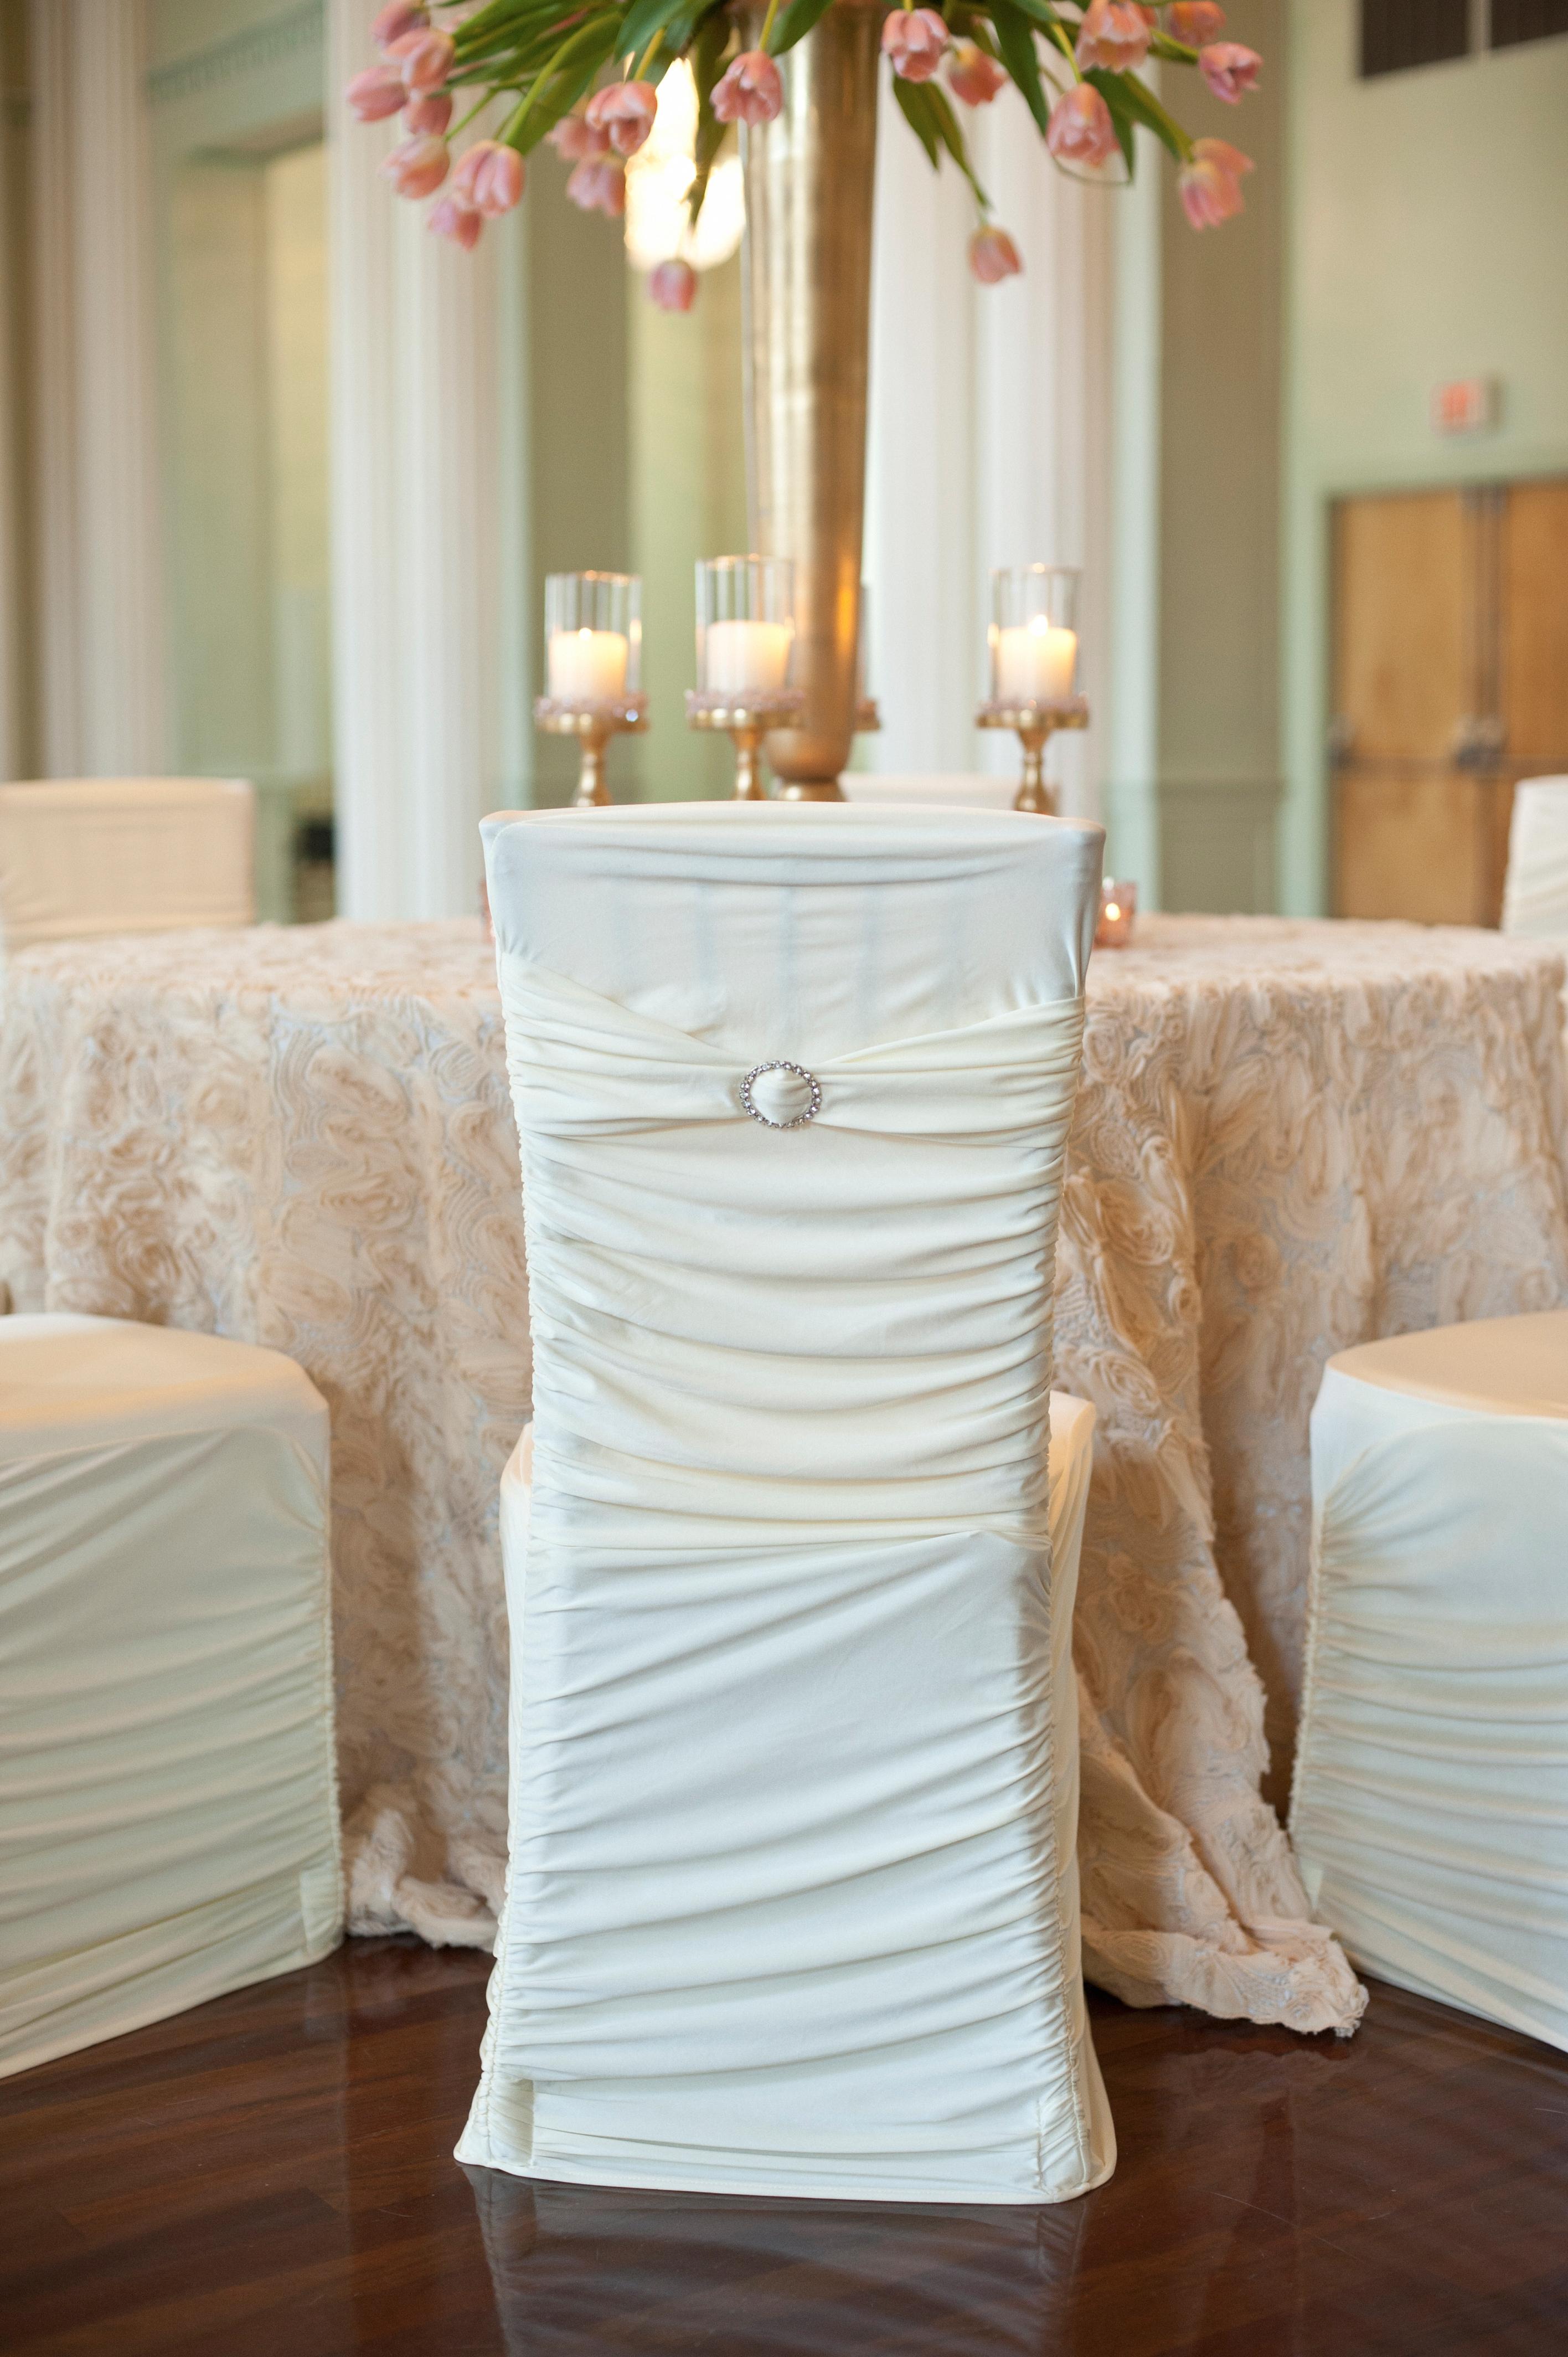 White Stretch Ribbed Chivari Chair Cover